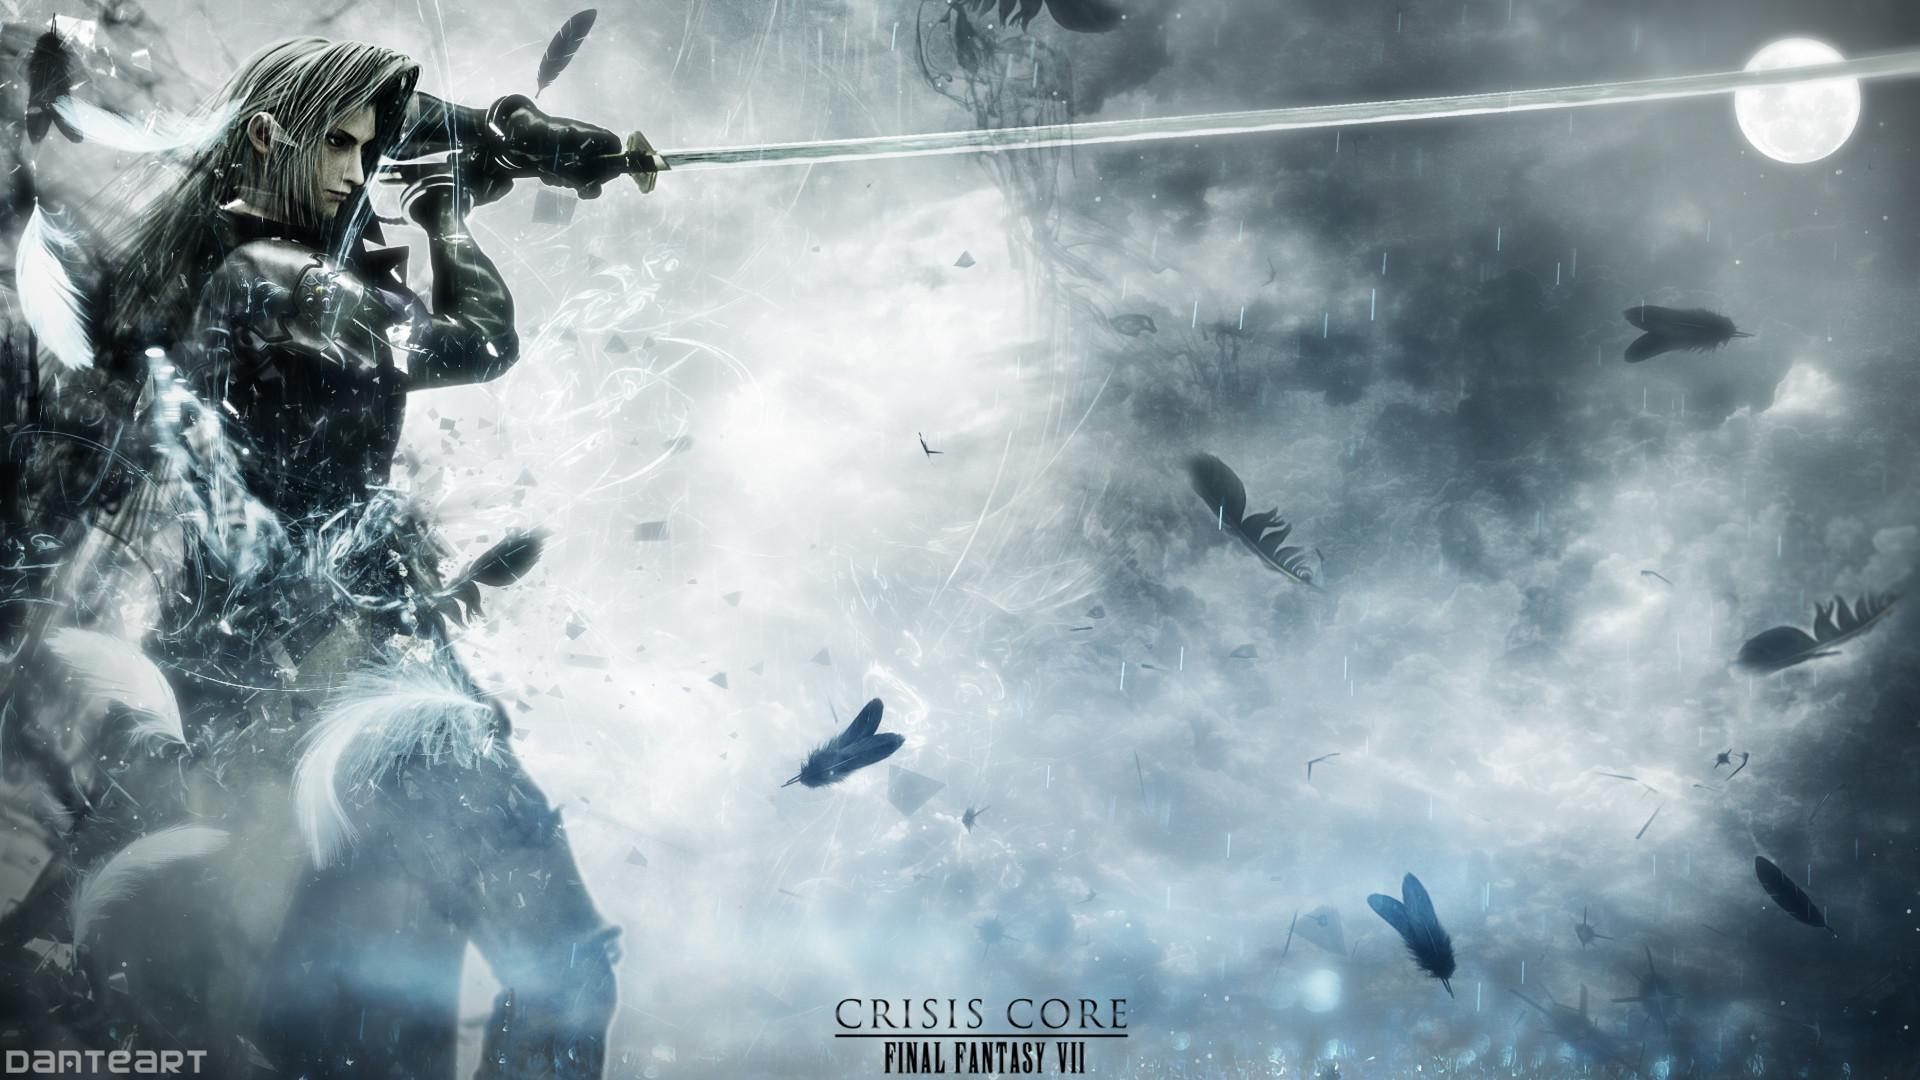 Final Fantasy Vii Remake Wallpapers Wallpaper Cave